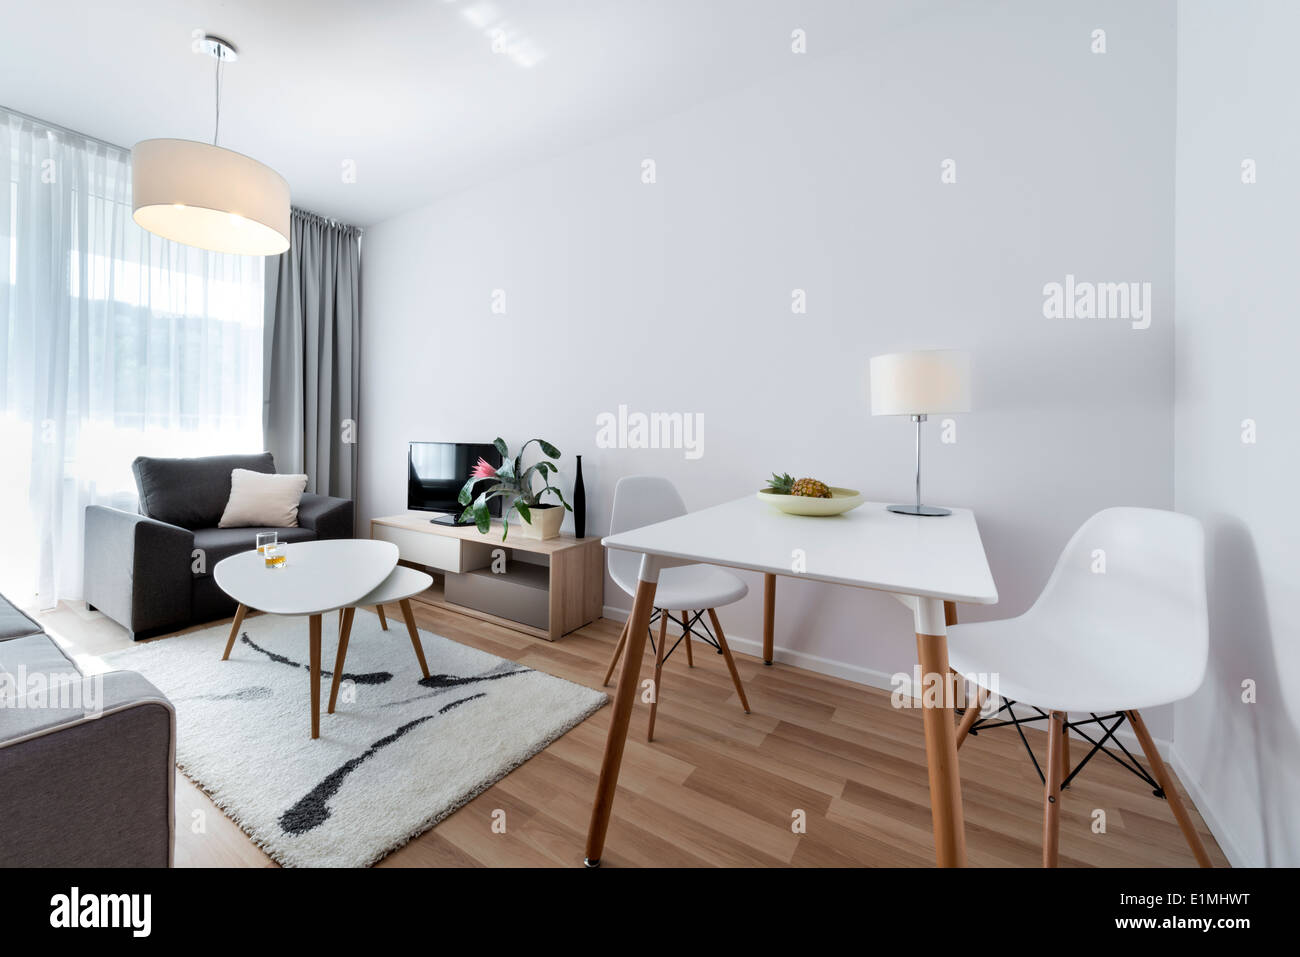 Modern white interior design room in scandinavian style stock image